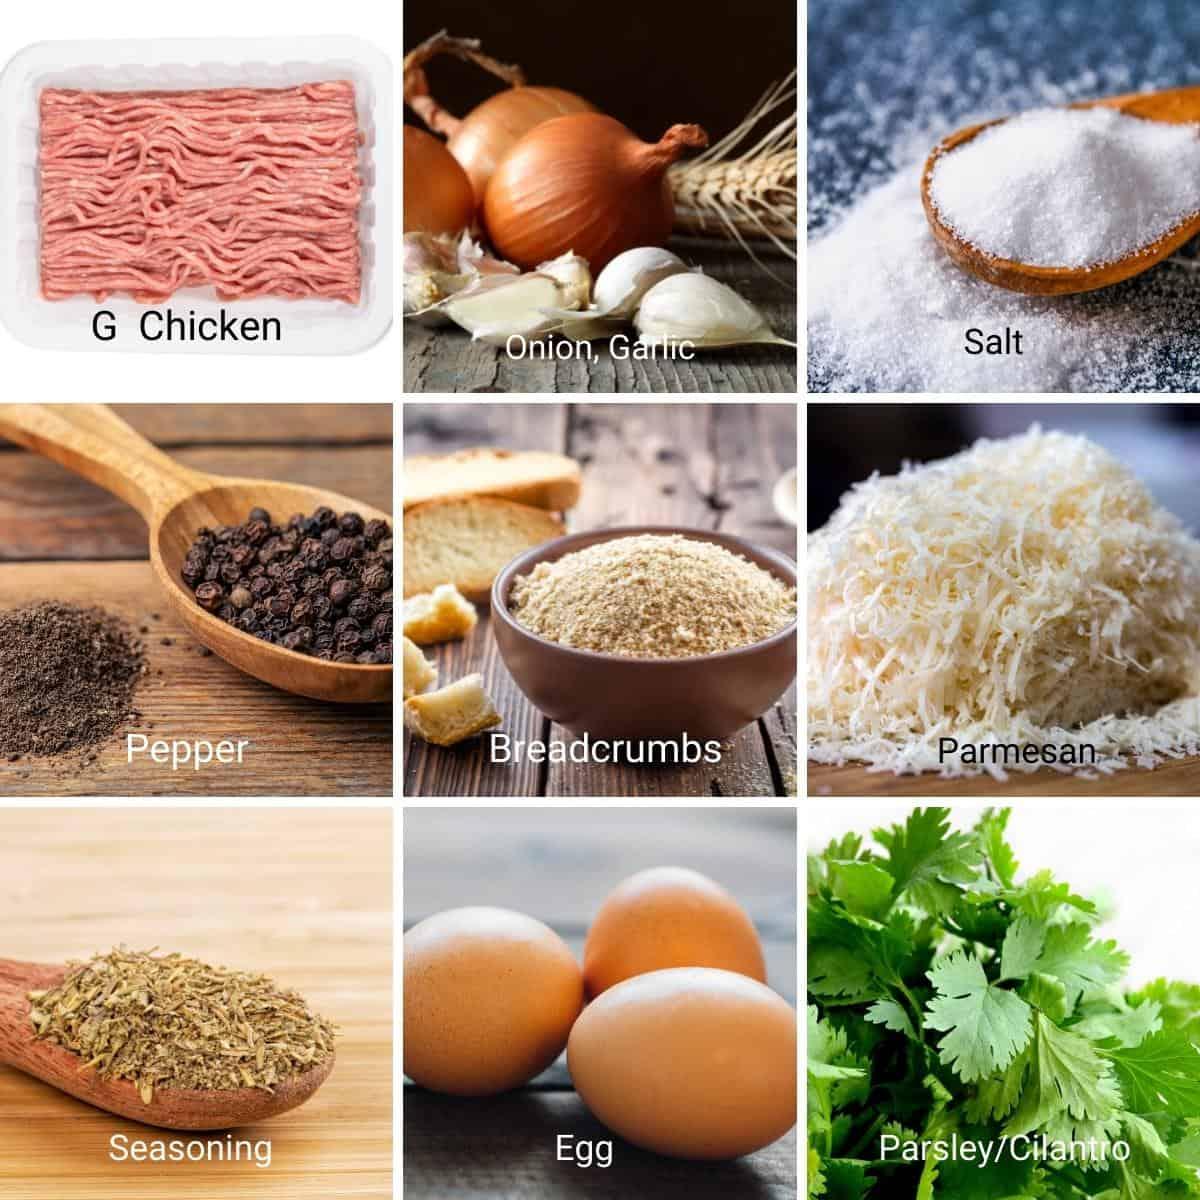 Ingredients shot collage for chicken patties.